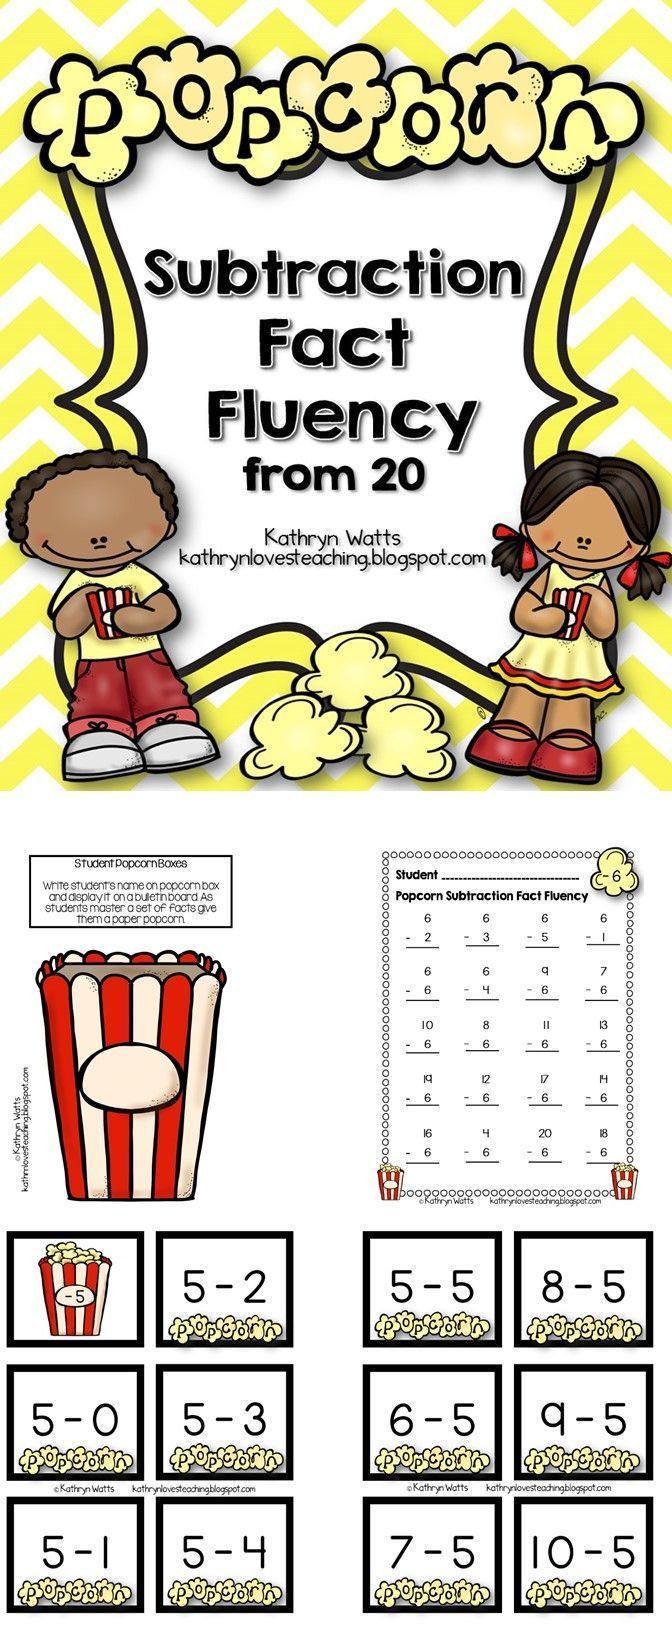 85535 best Education K-5 images on Pinterest | Teaching ideas ...